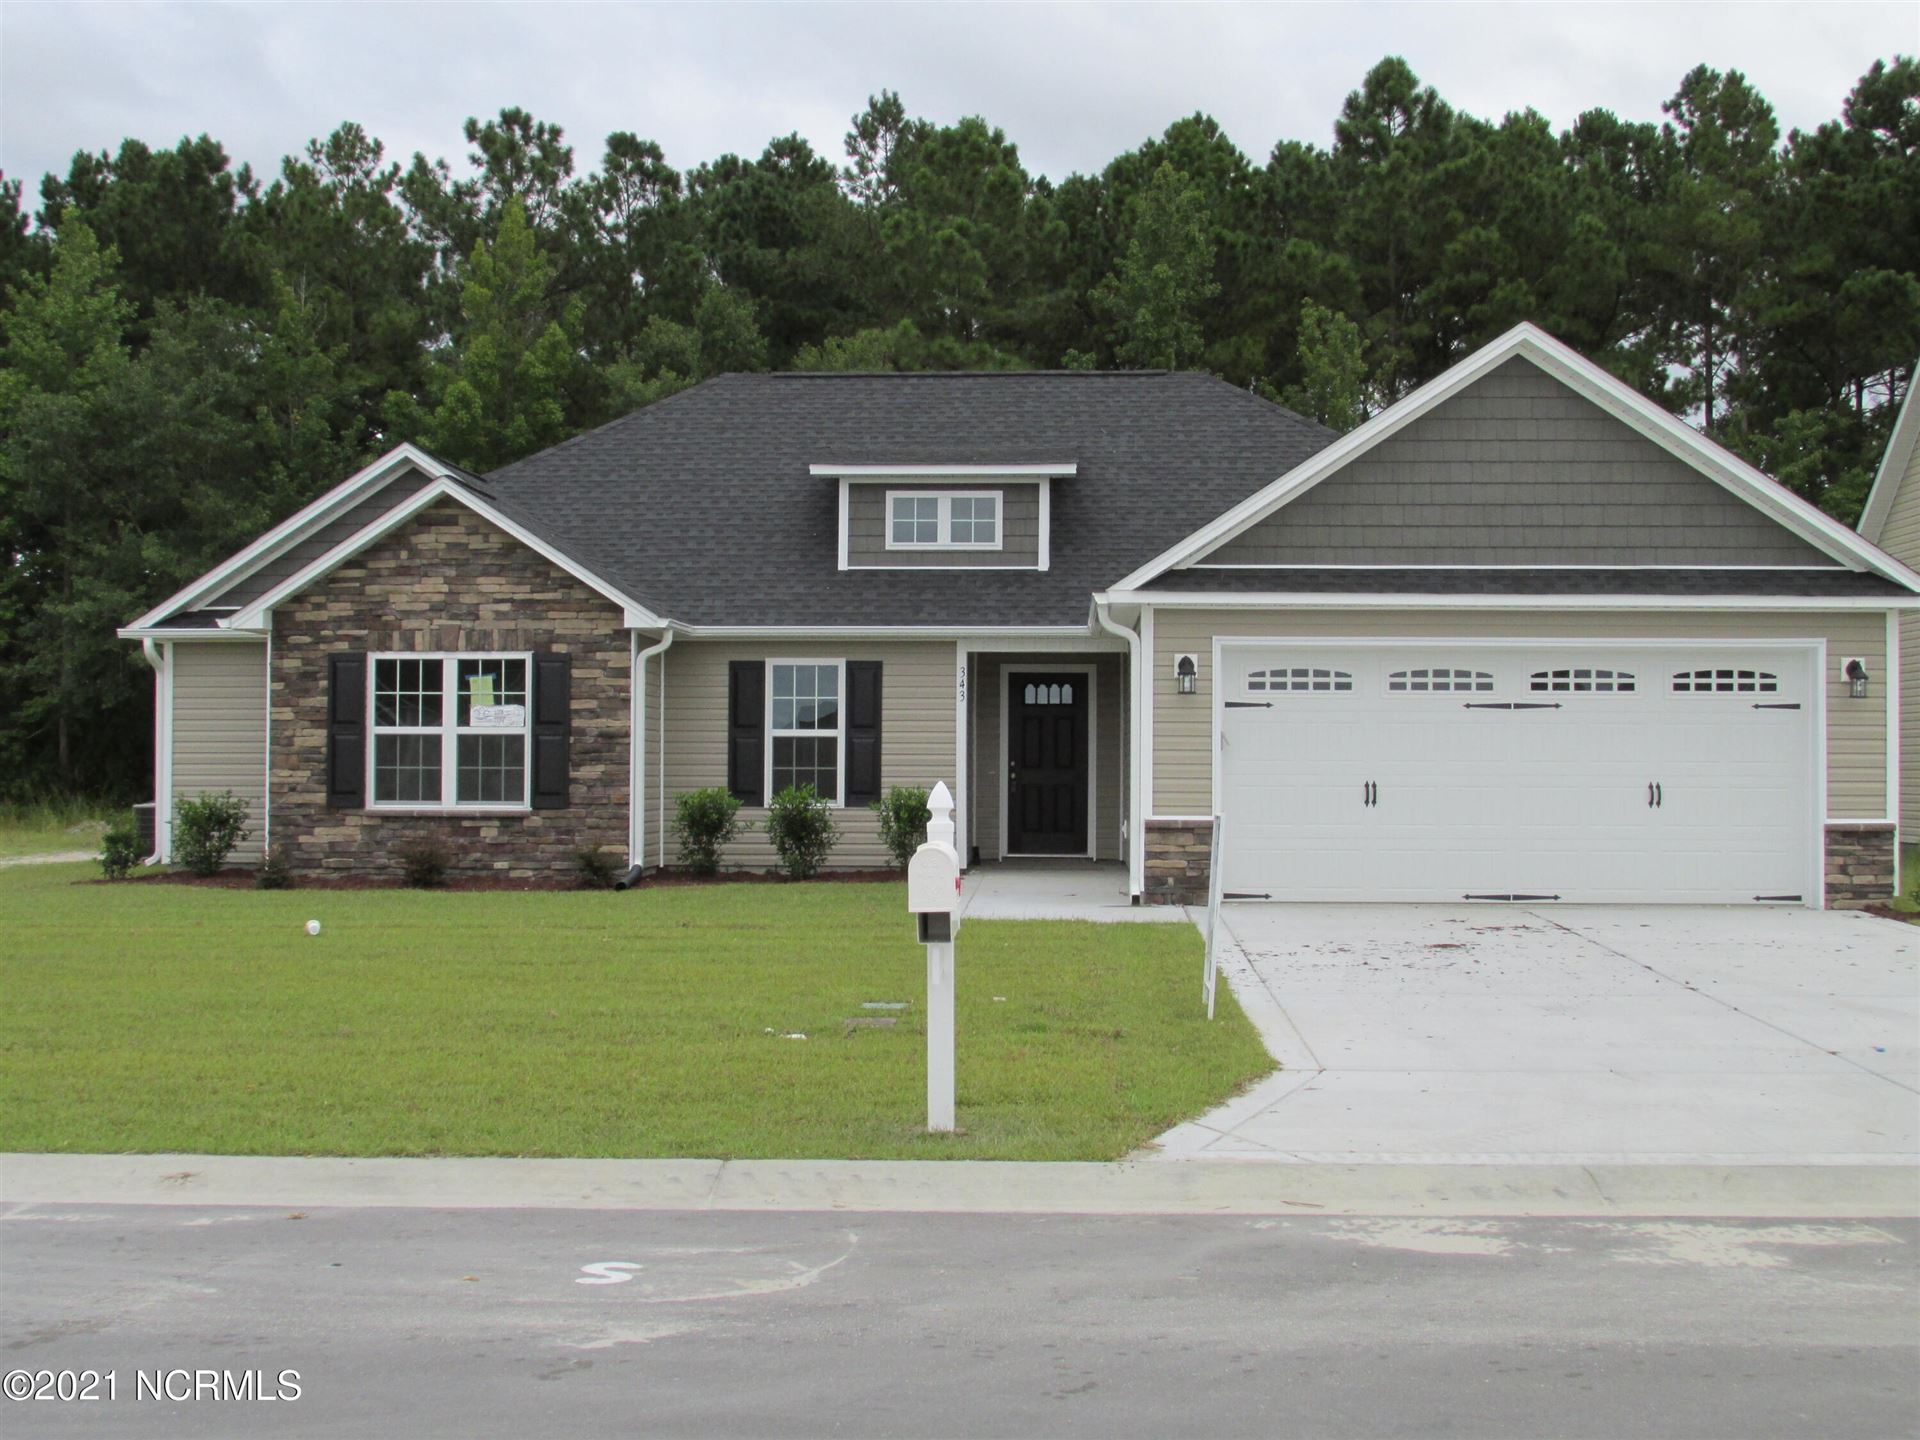 Photo of 343 Merin Height Road, Jacksonville, NC 28546 (MLS # 100267997)